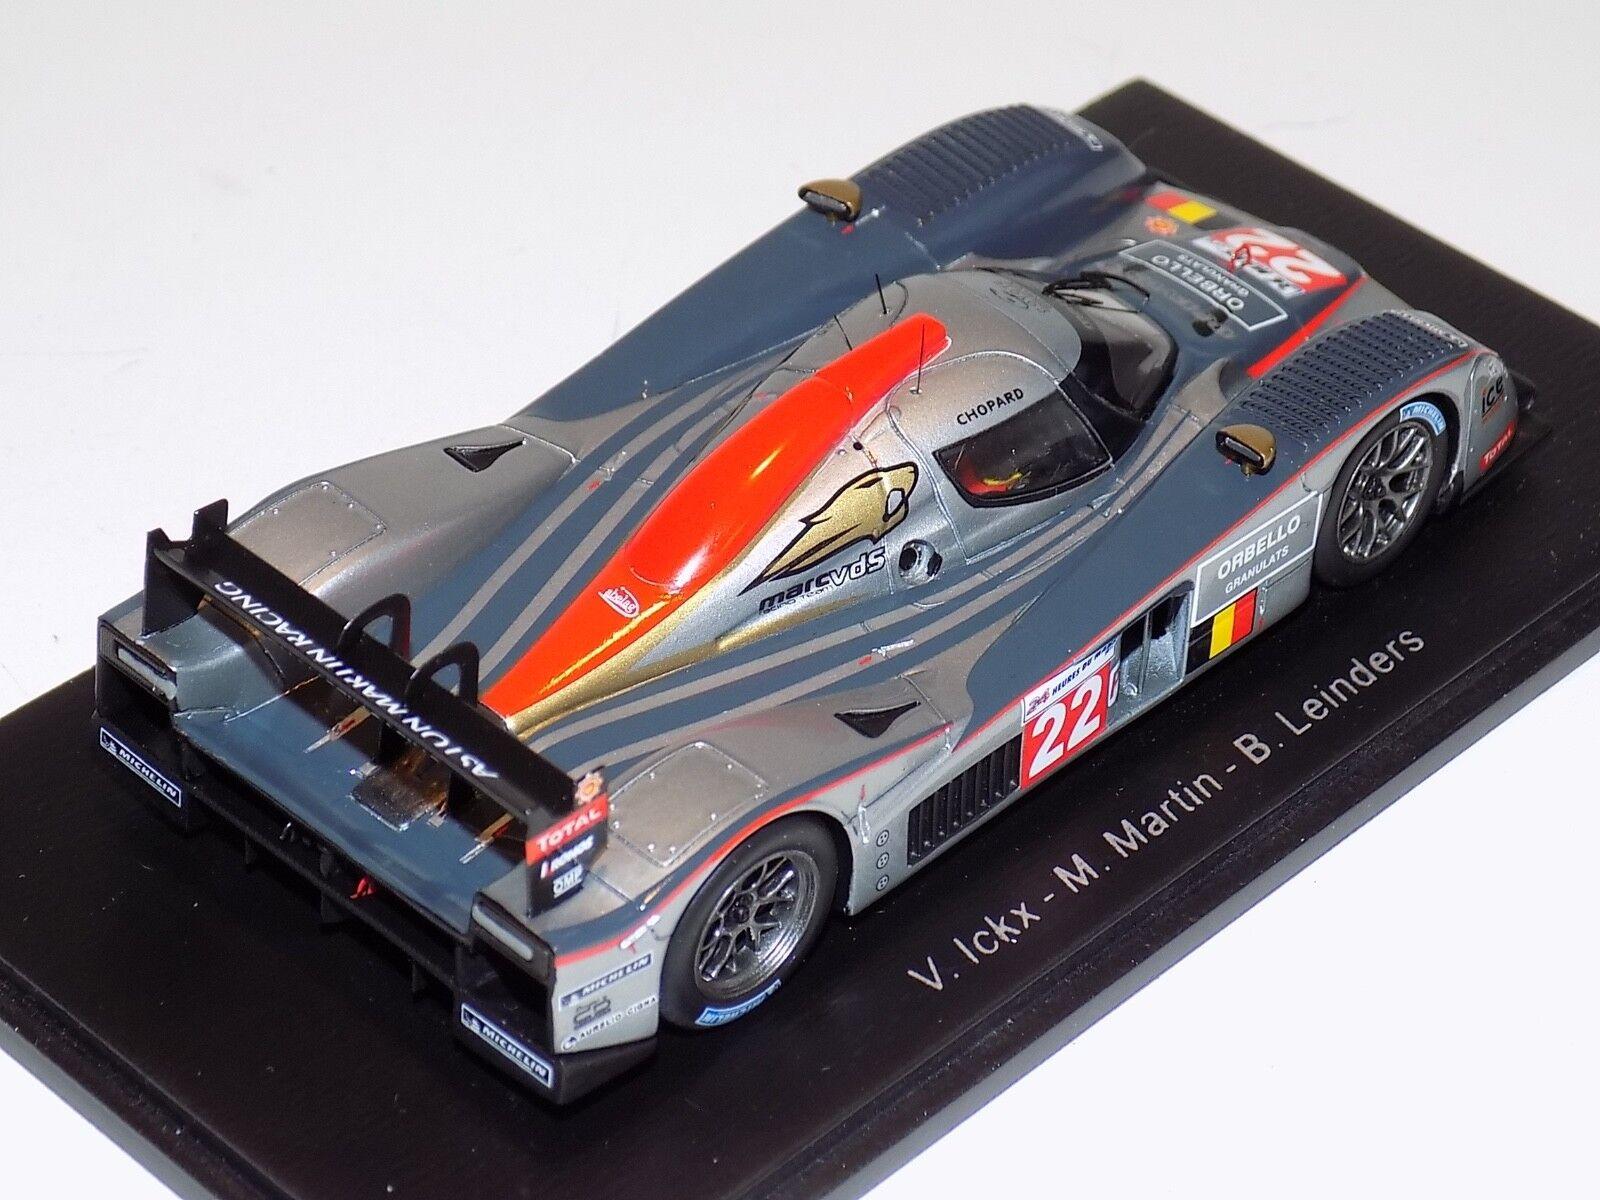 1 43 Spark Lola Lola Lola Aston Martin Car Kronos  th 2011 24 H of Le Mans  S2529 c8107c